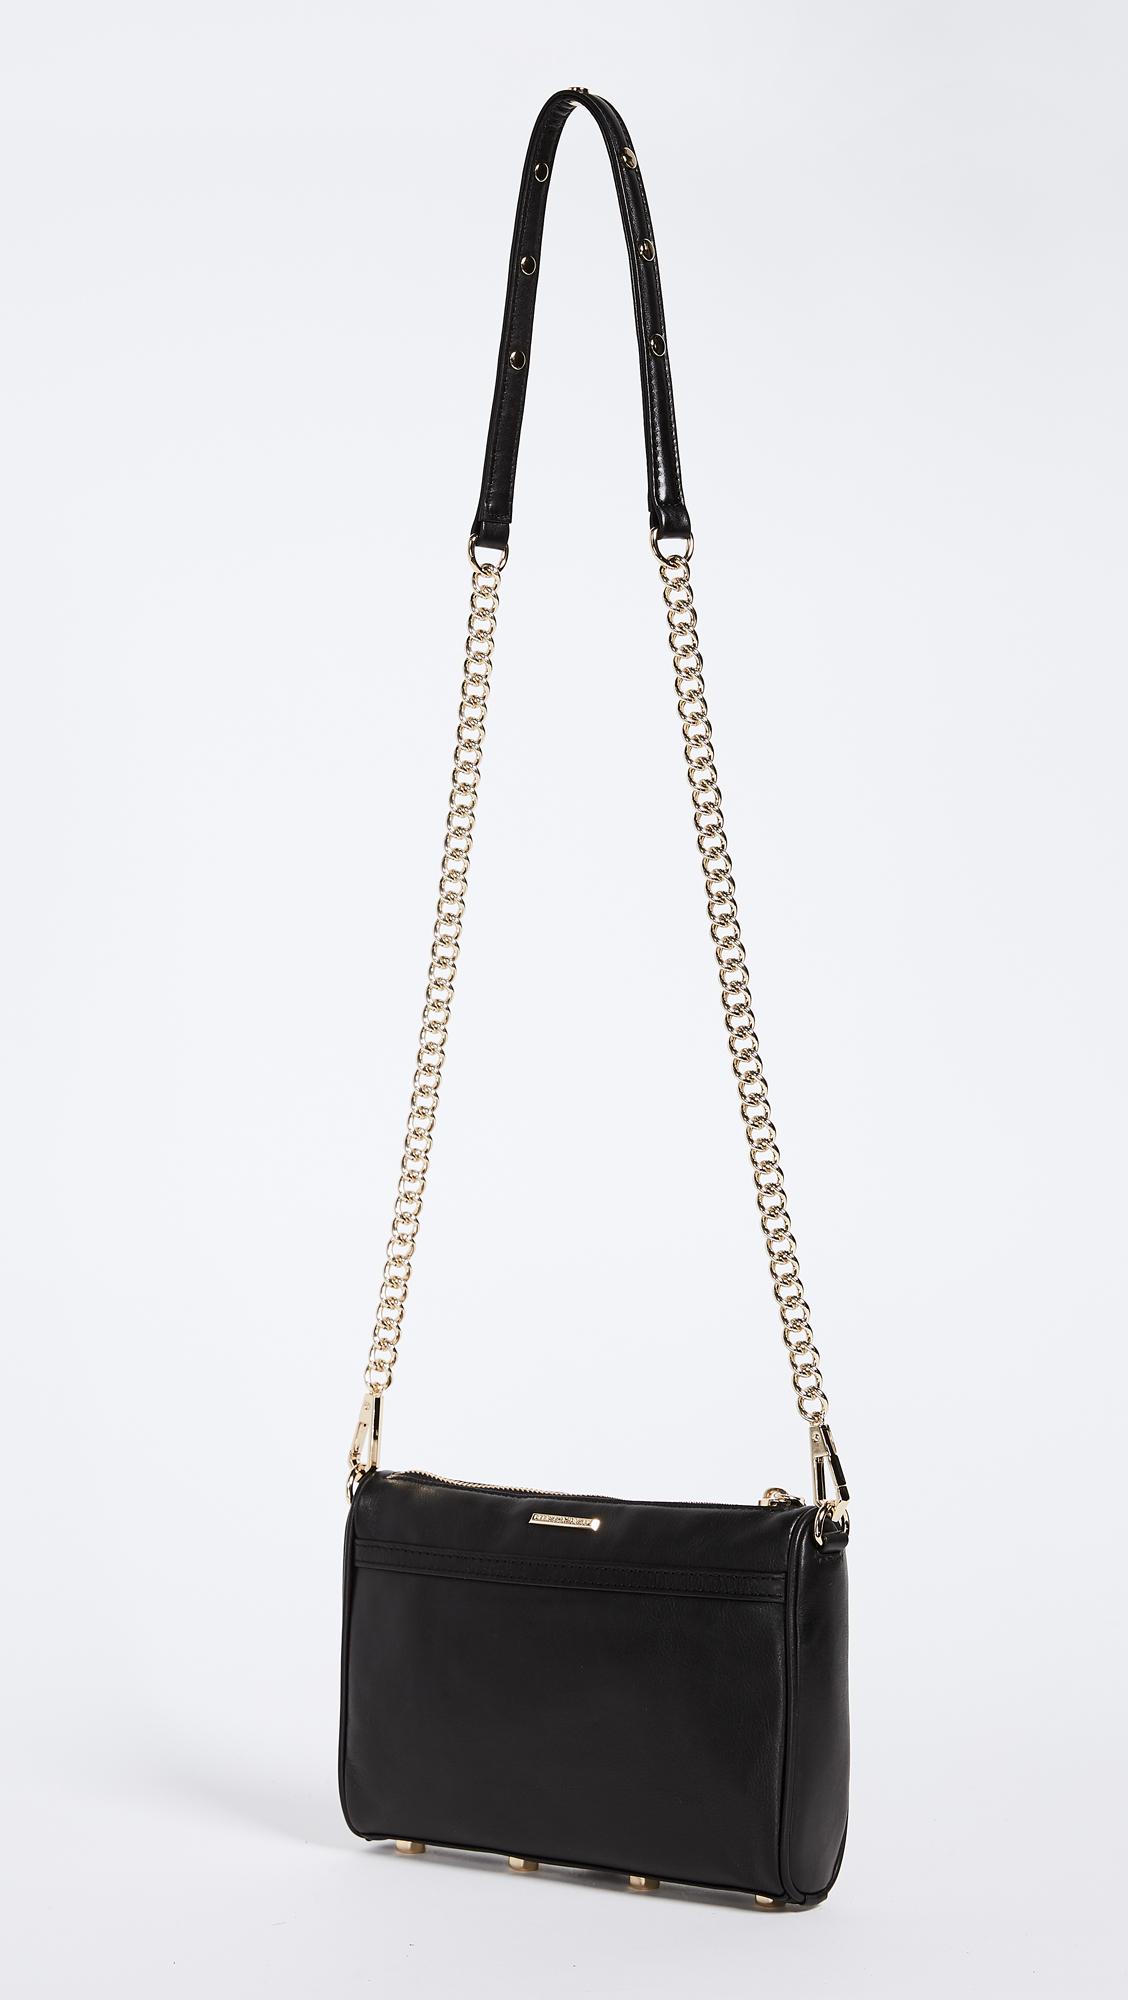 Rebecca Minkoff Mini Mac Bag Shopbop Shanghai Gold Crossbody Black